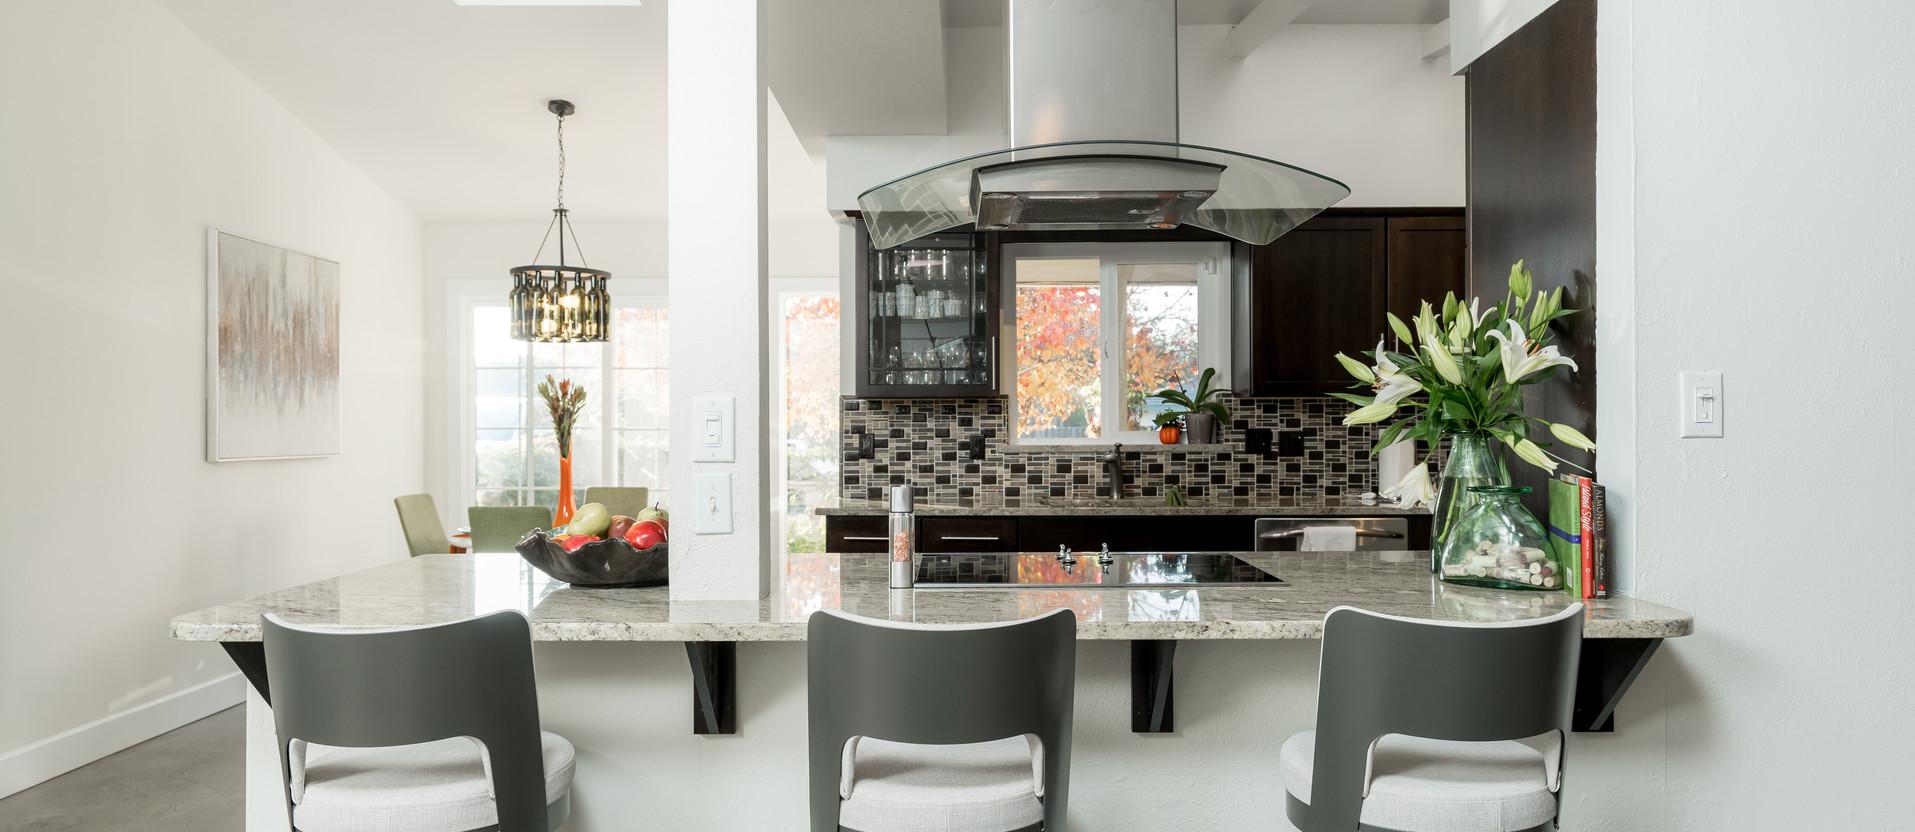 Mid Century Kitchen/Nook